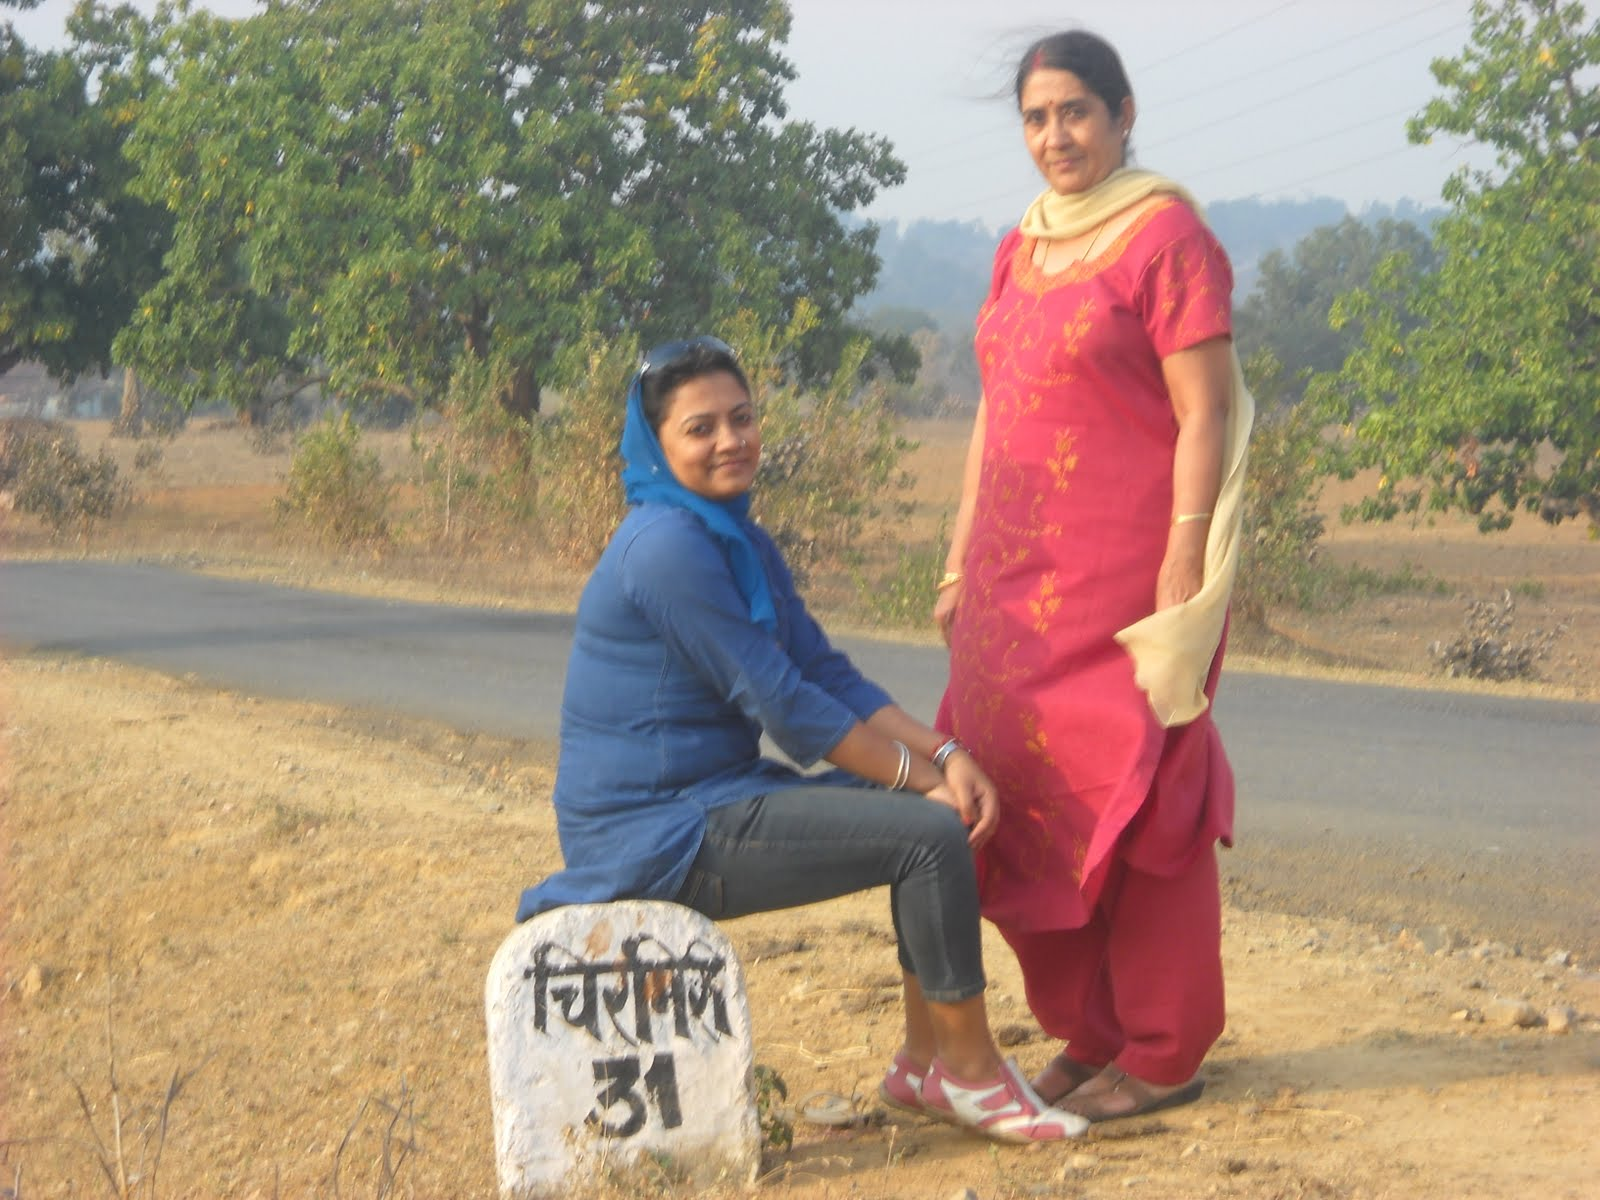 Hot Indian Aunties Sexy Photos Saree Pics North Indian Aunty-1627